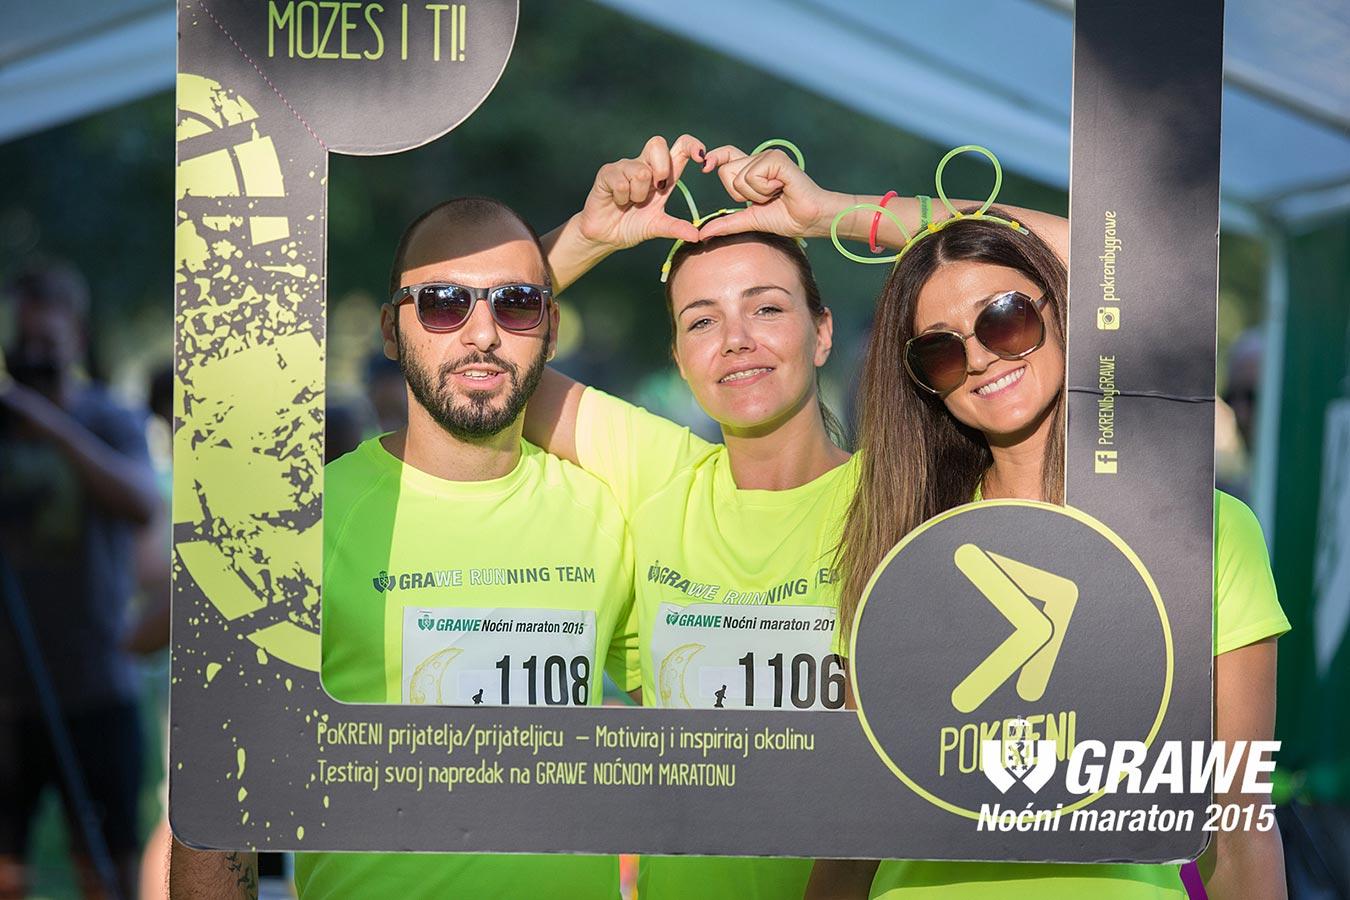 GRAWE RUNNING TEAM na tronu GRAWE noćnog maratona 2015.